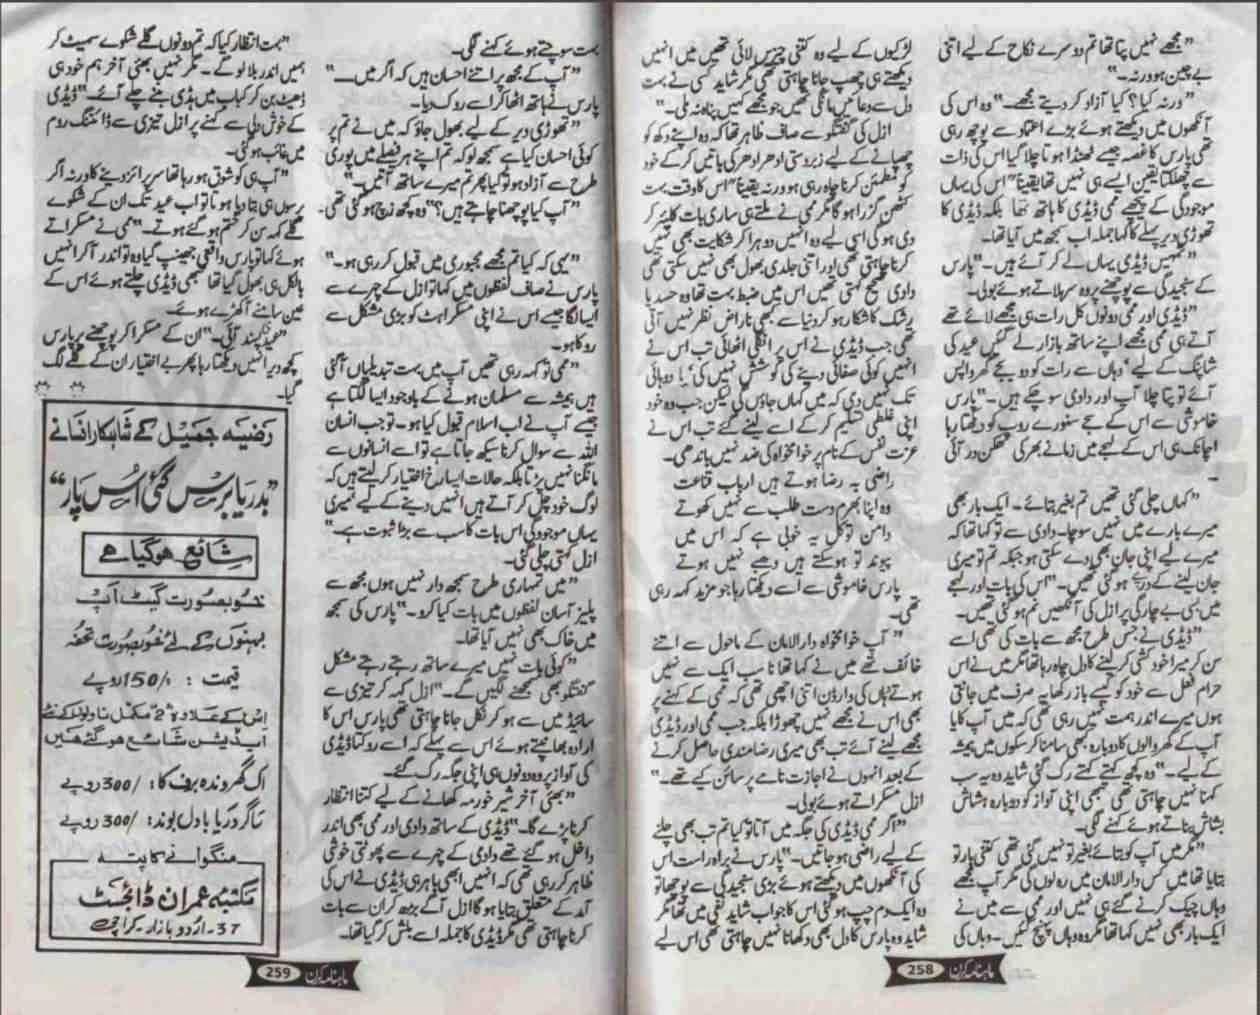 Kitab Dost: Hadsay hi zindagi hain by Fouzia Yasmeen Online Reading